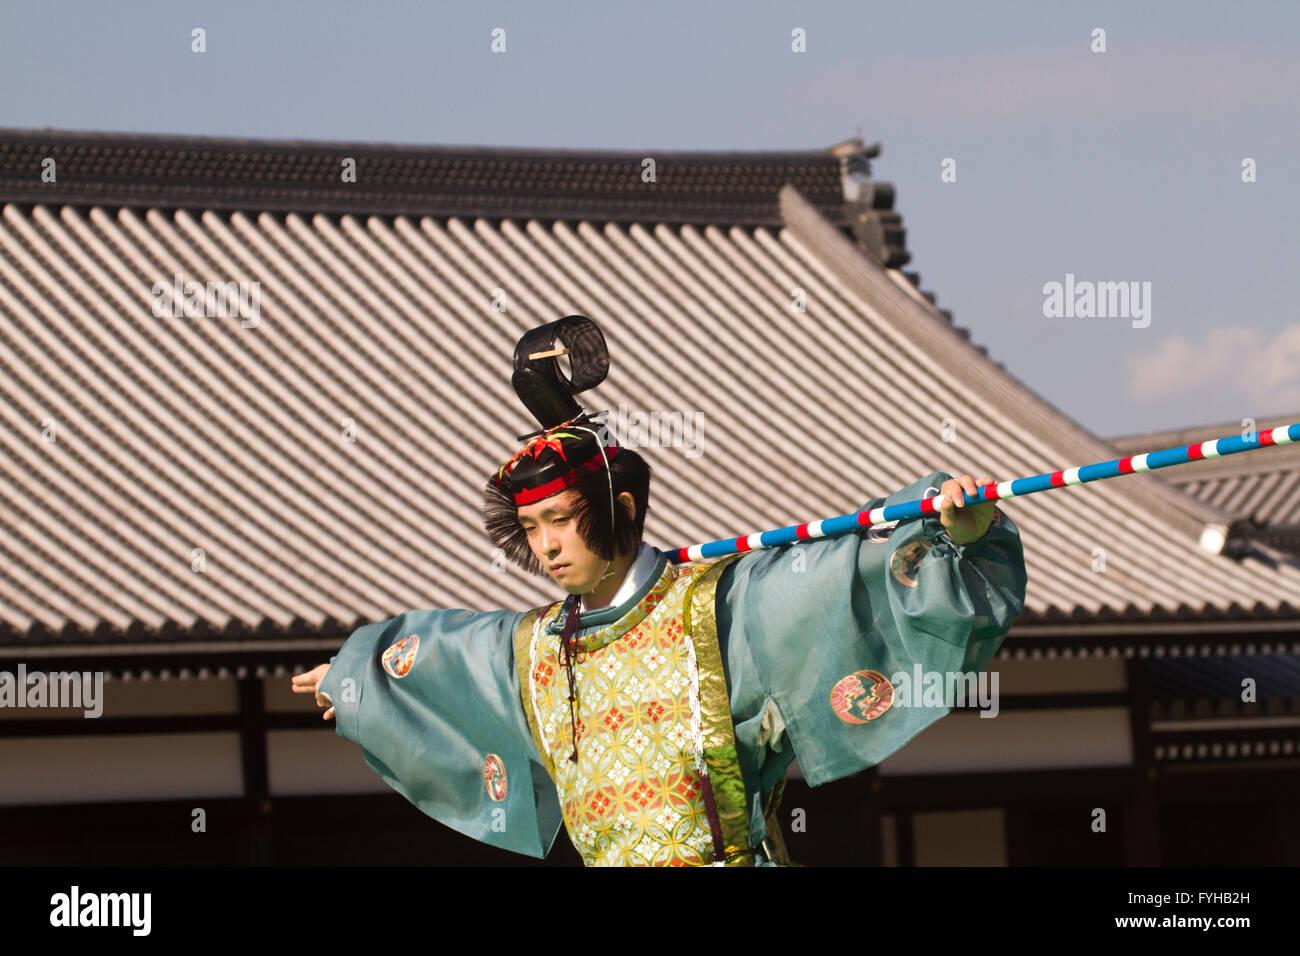 Japan, Kyoto, Imperial Palace, Man wearing traditional Japanese clothing Jidai Matsuri (Festival of Ages) - Stock Image